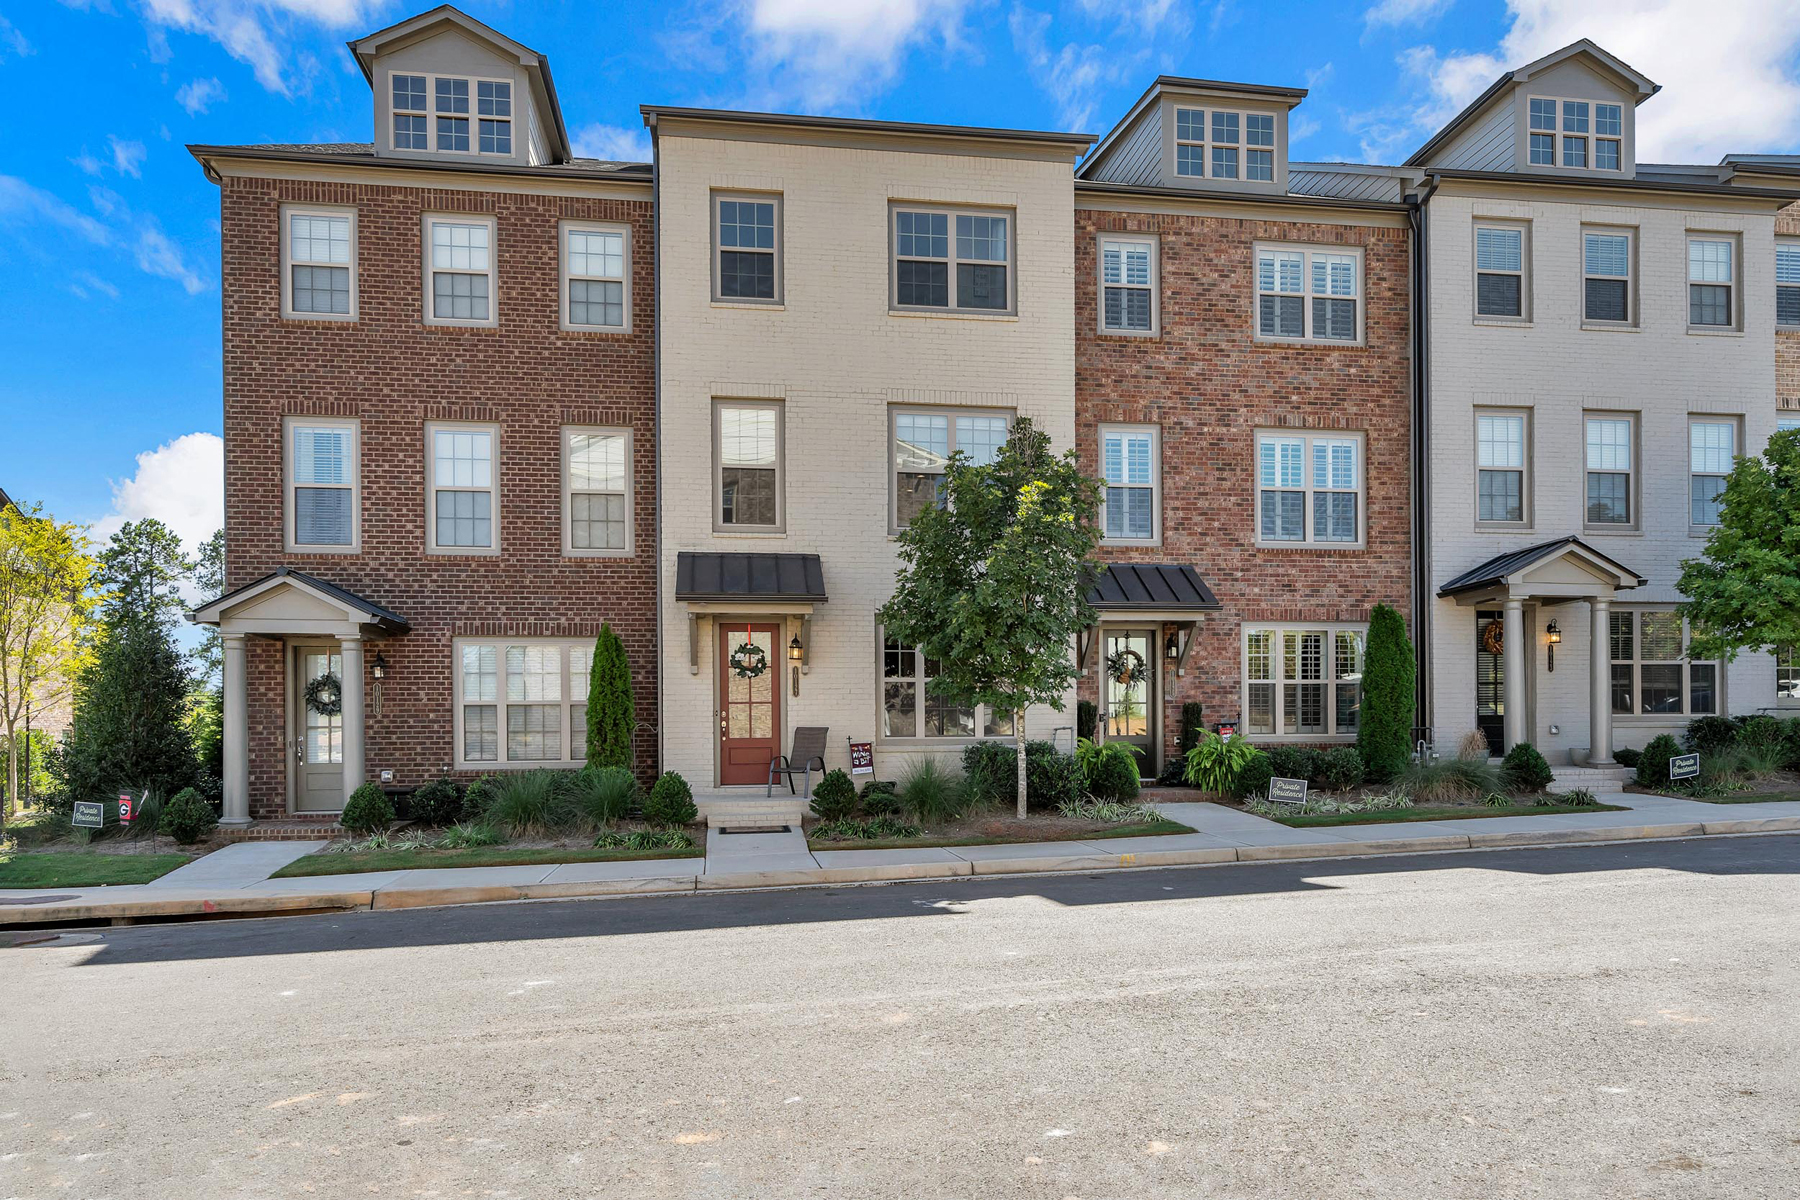 townhouses のために 売買 アット Charleston Inspired Townhome with Resort-Like Amenities 10127 Windalier Way, Roswell, ジョージア 30076 アメリカ